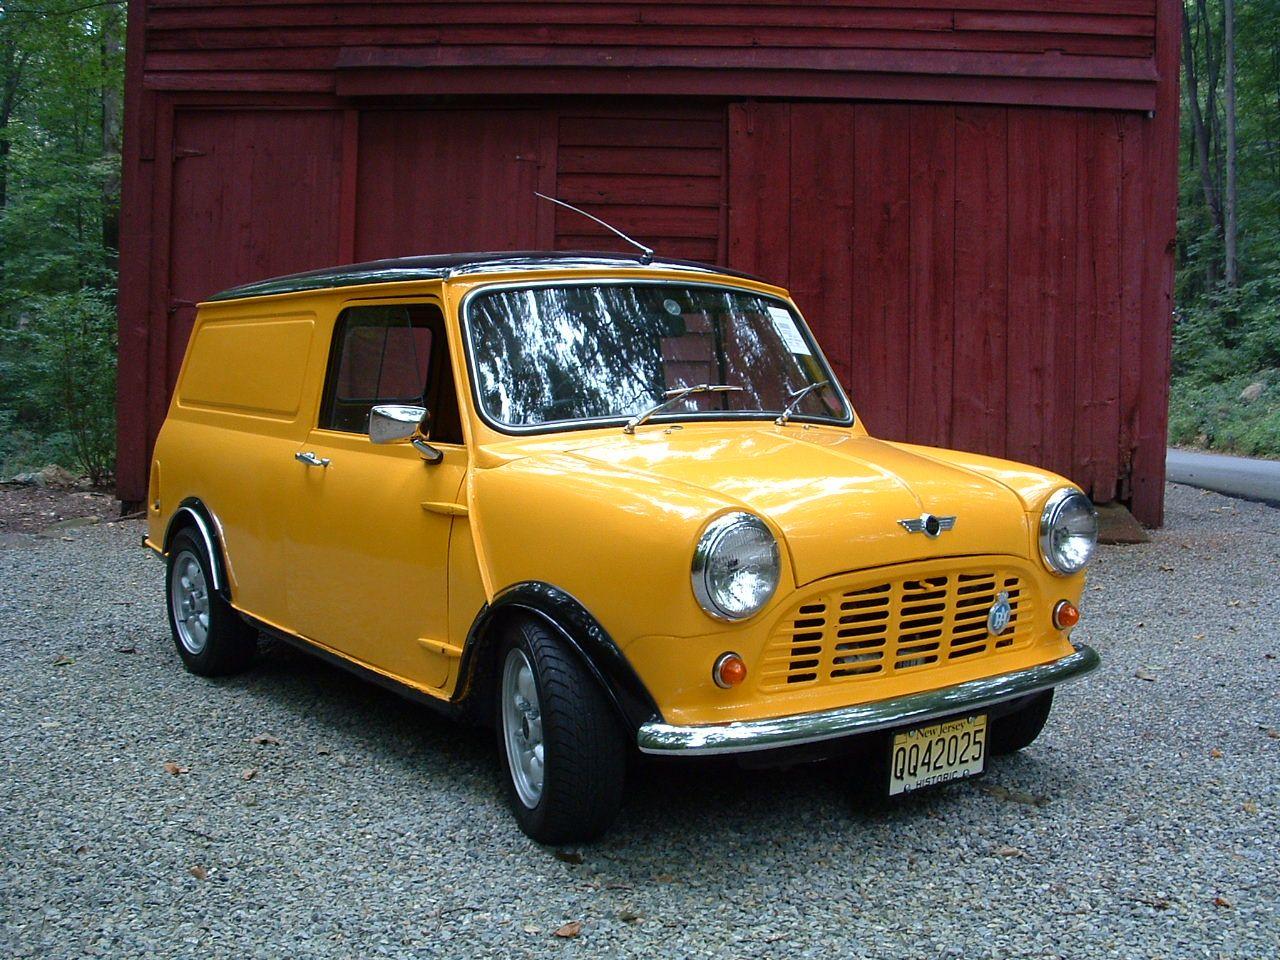 Austin mini van | Mini cooper | Pinterest | Mini vans, Minis and Vans